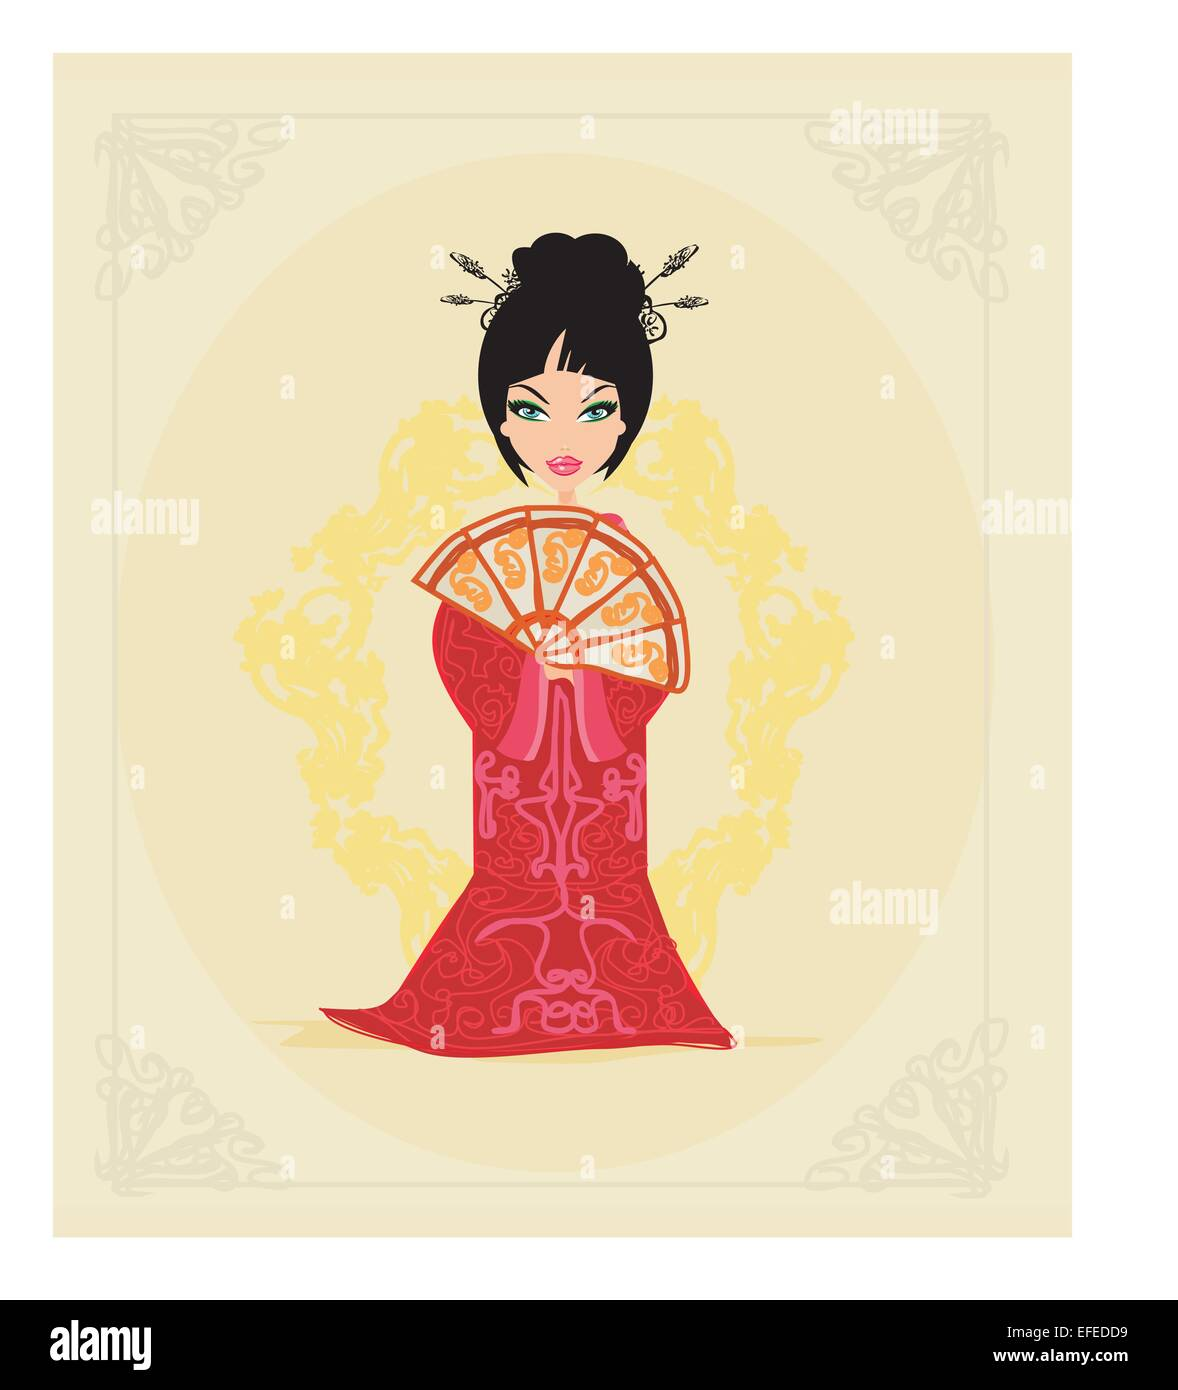 Japanese Little Girl Stock Vector Images - Alamy